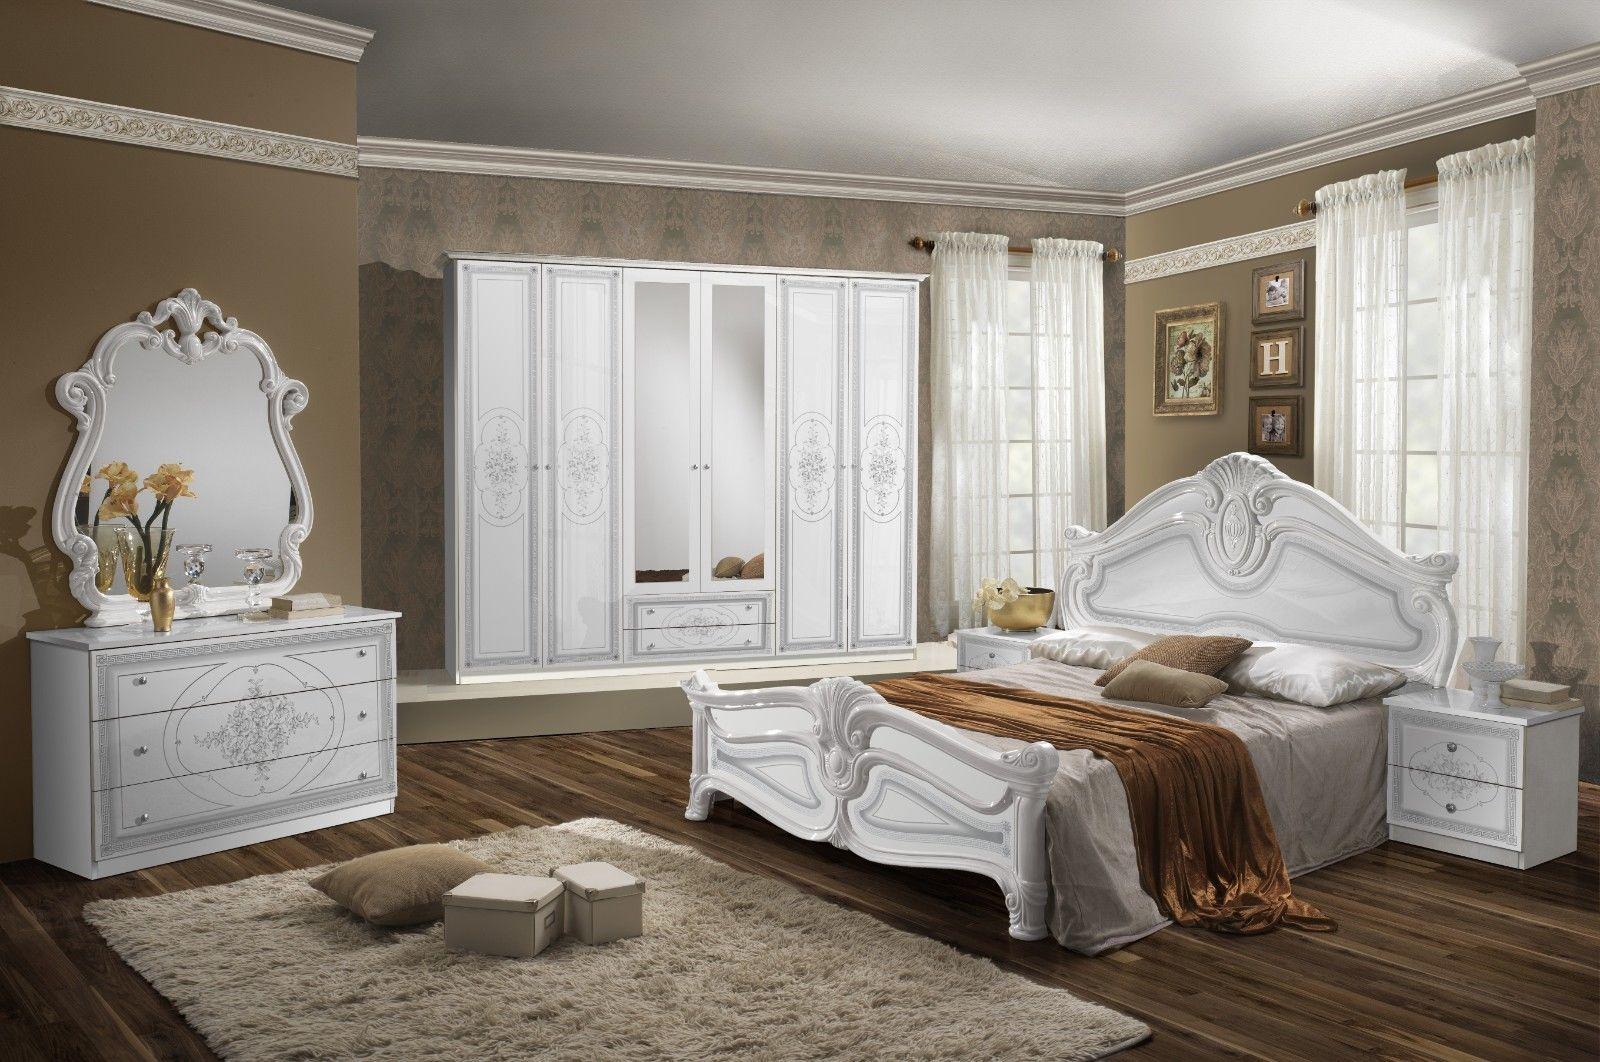 Amalfi Bedroom Range Bedroom Set - Leen Furniture And ...